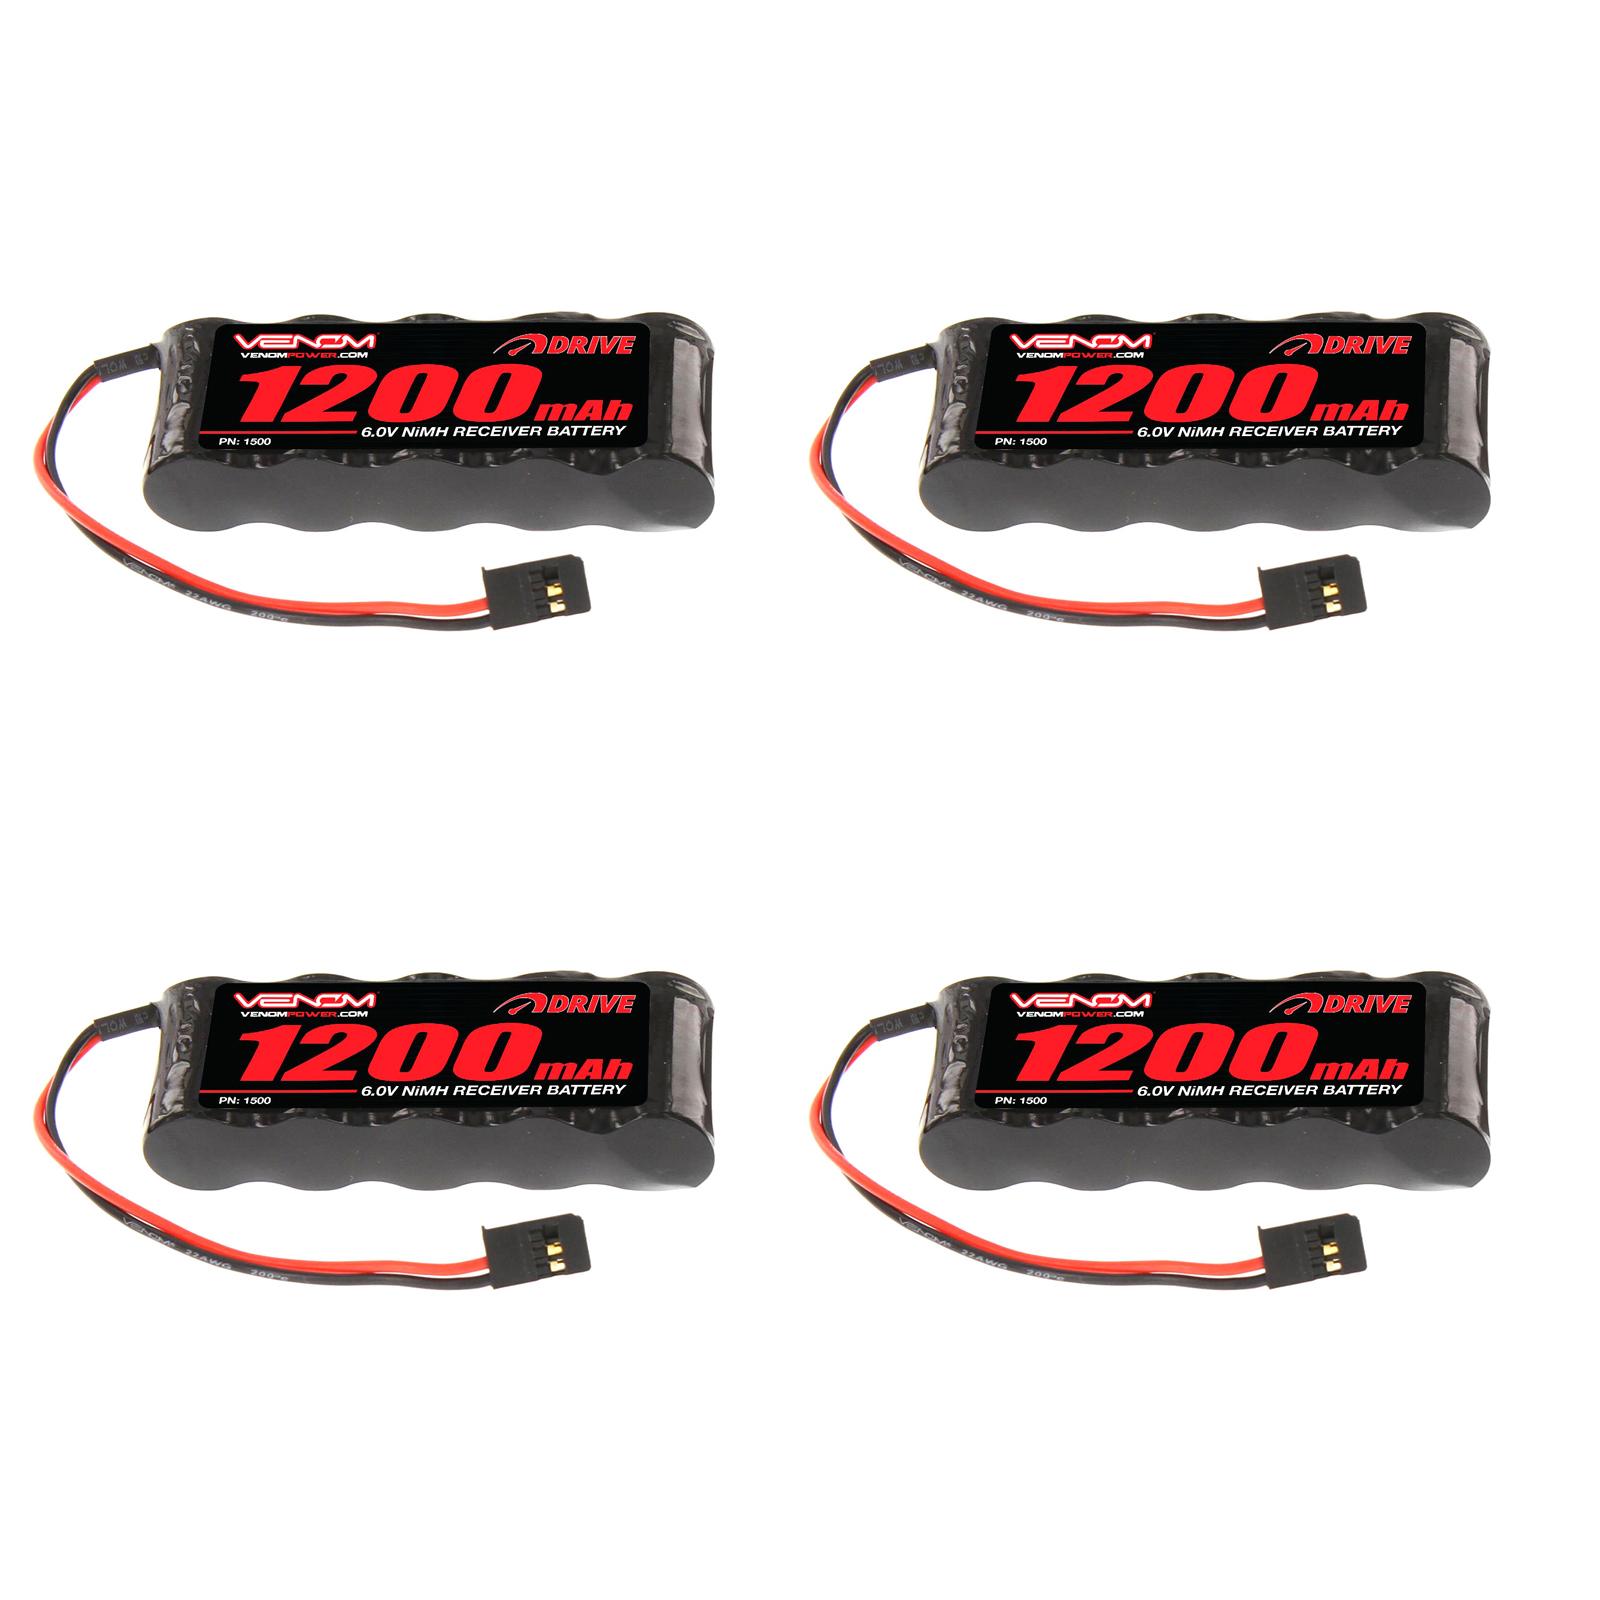 Venom Group International 1500 6V 1200 mAh NiMH Flat RX Battery